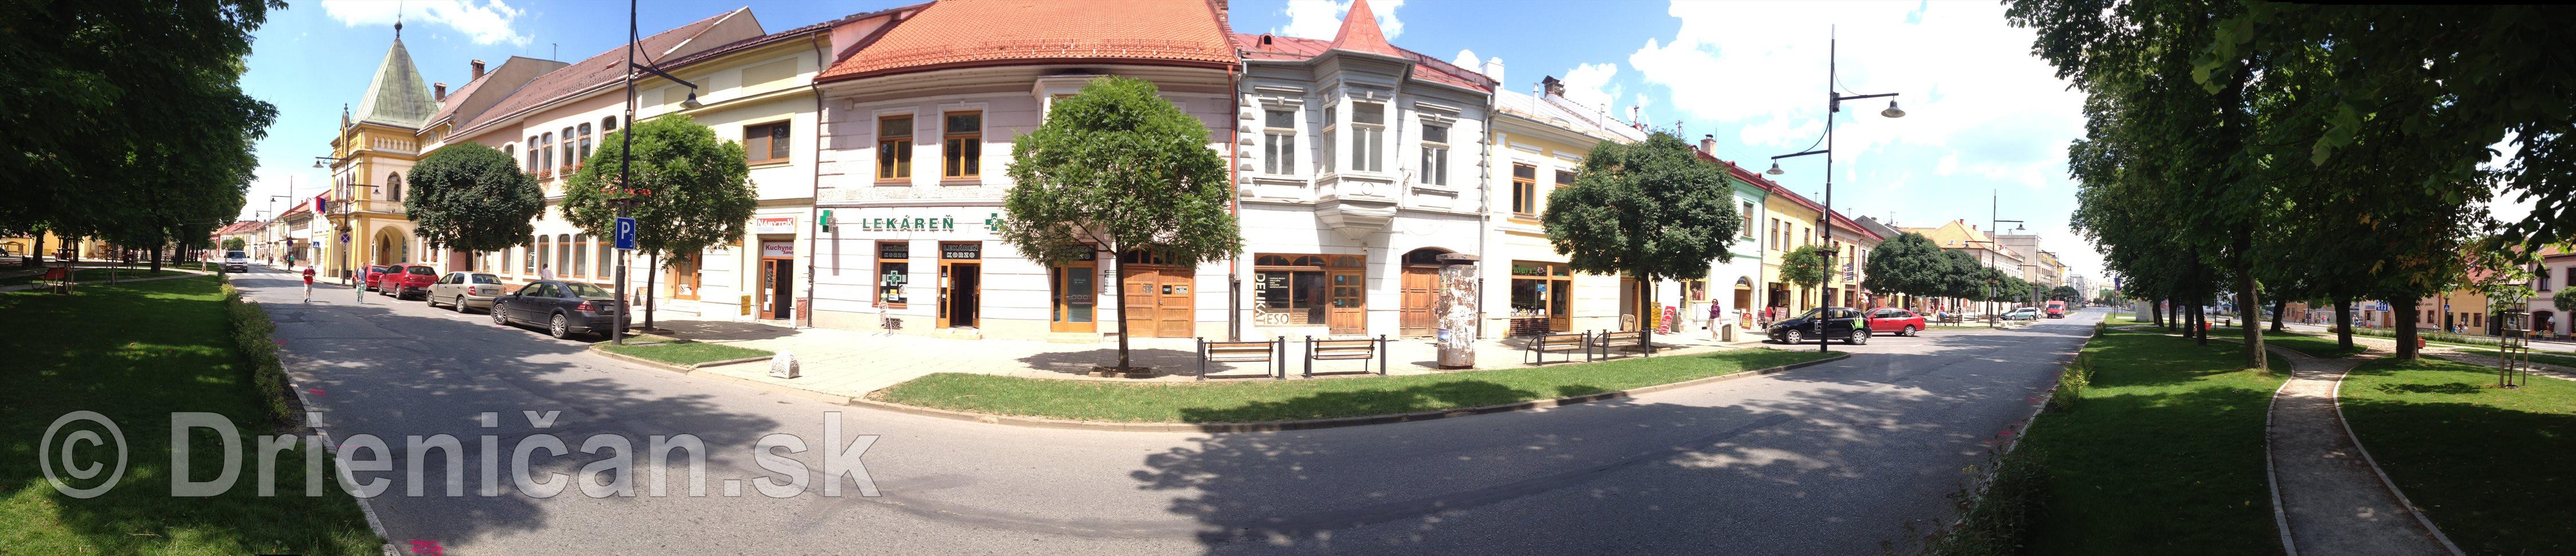 Panoráma mesta Sabinov